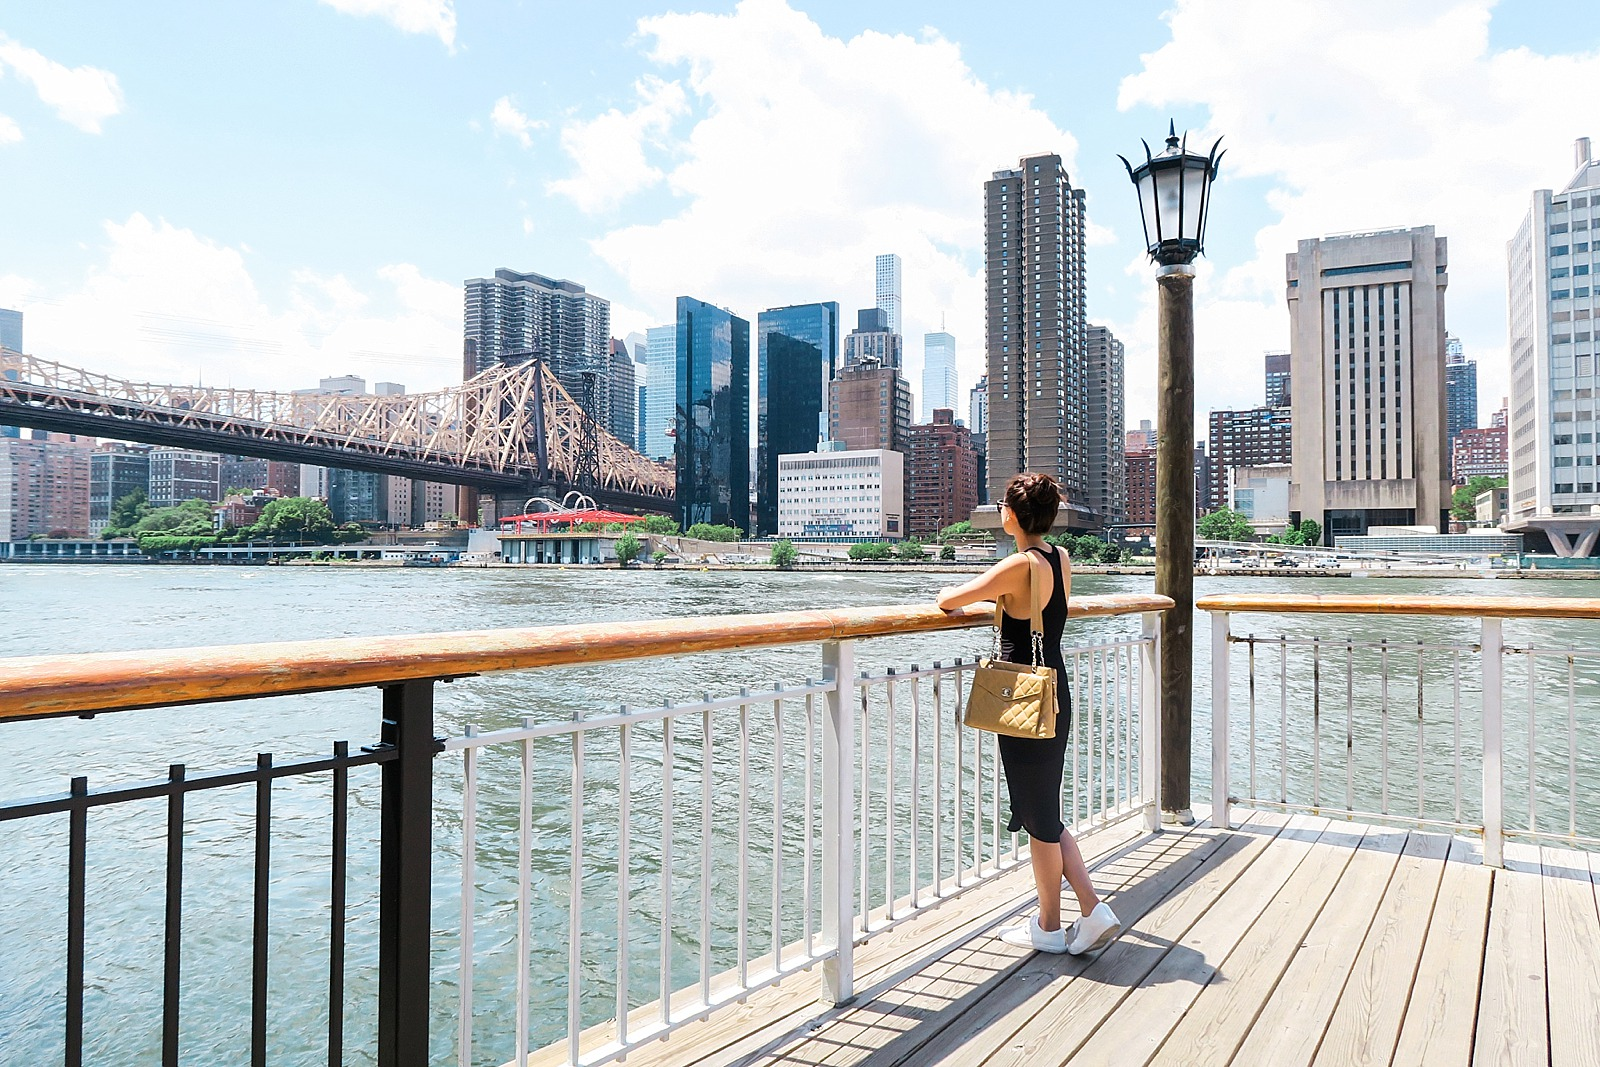 diana-elizabeth-steffen-phoenix-blogger-travel-new-york-brooklyn_0065